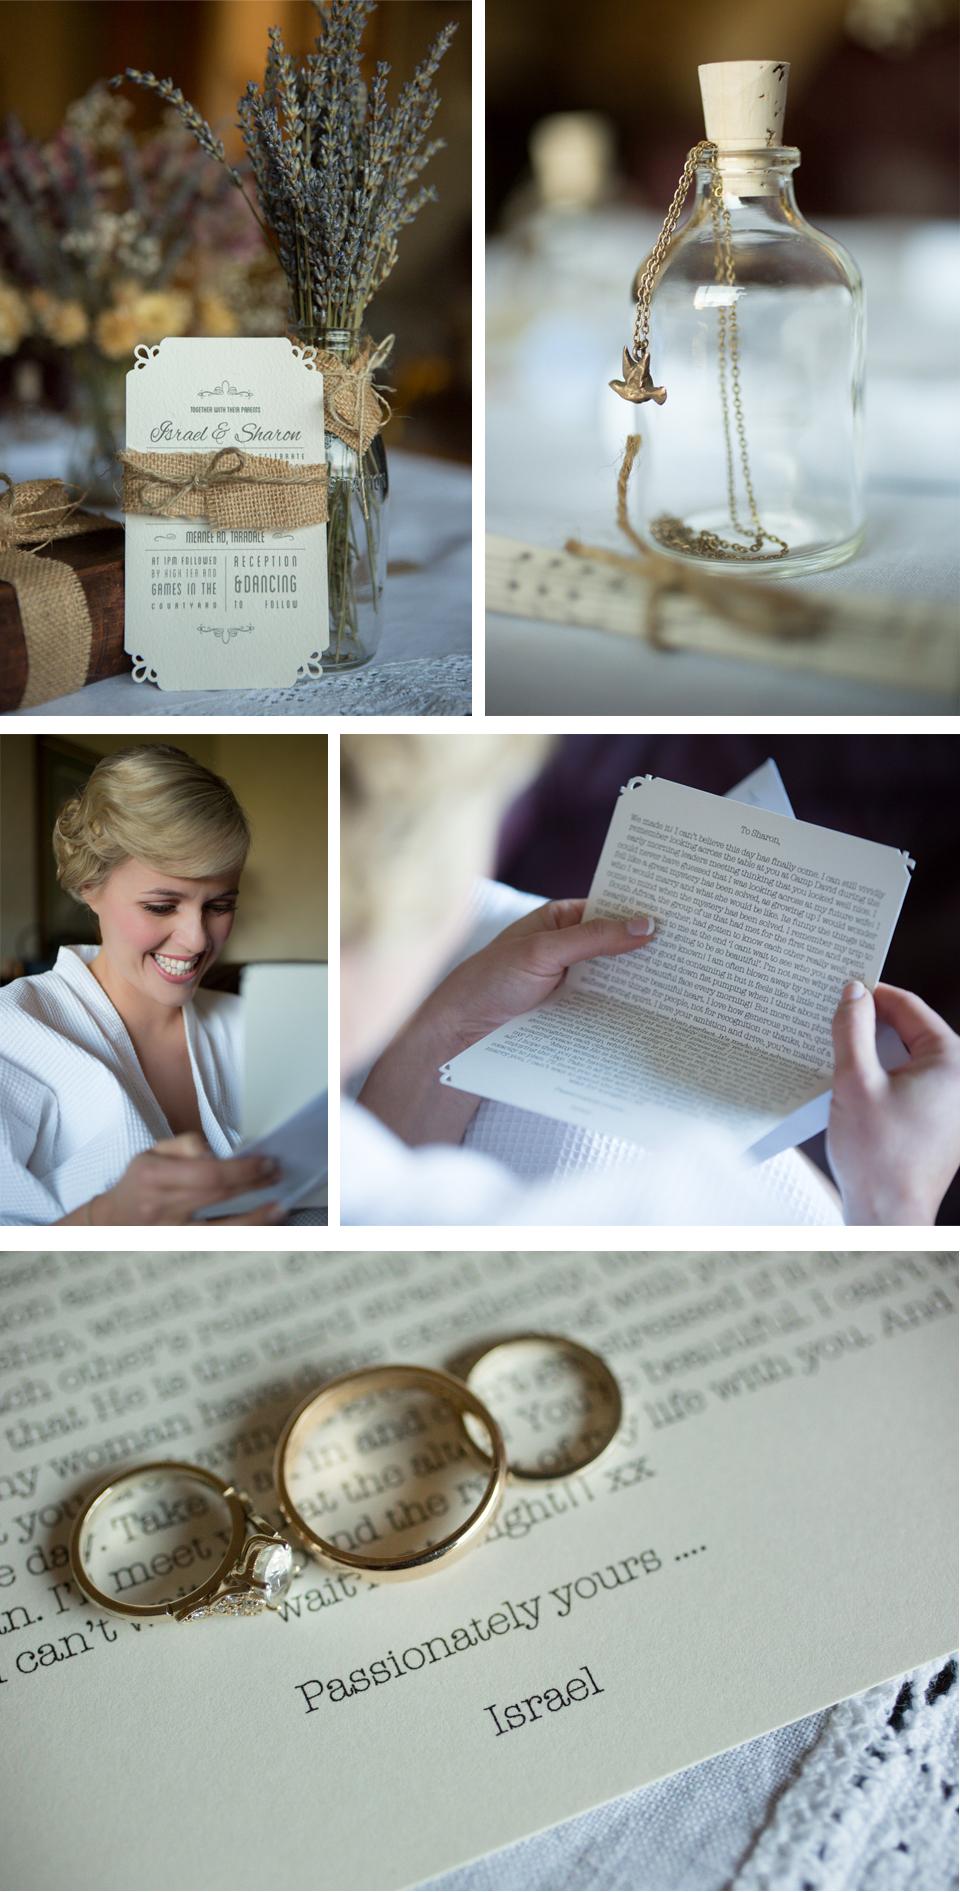 The-Old-Church-wedding-venues-Eva-Bradley (2)